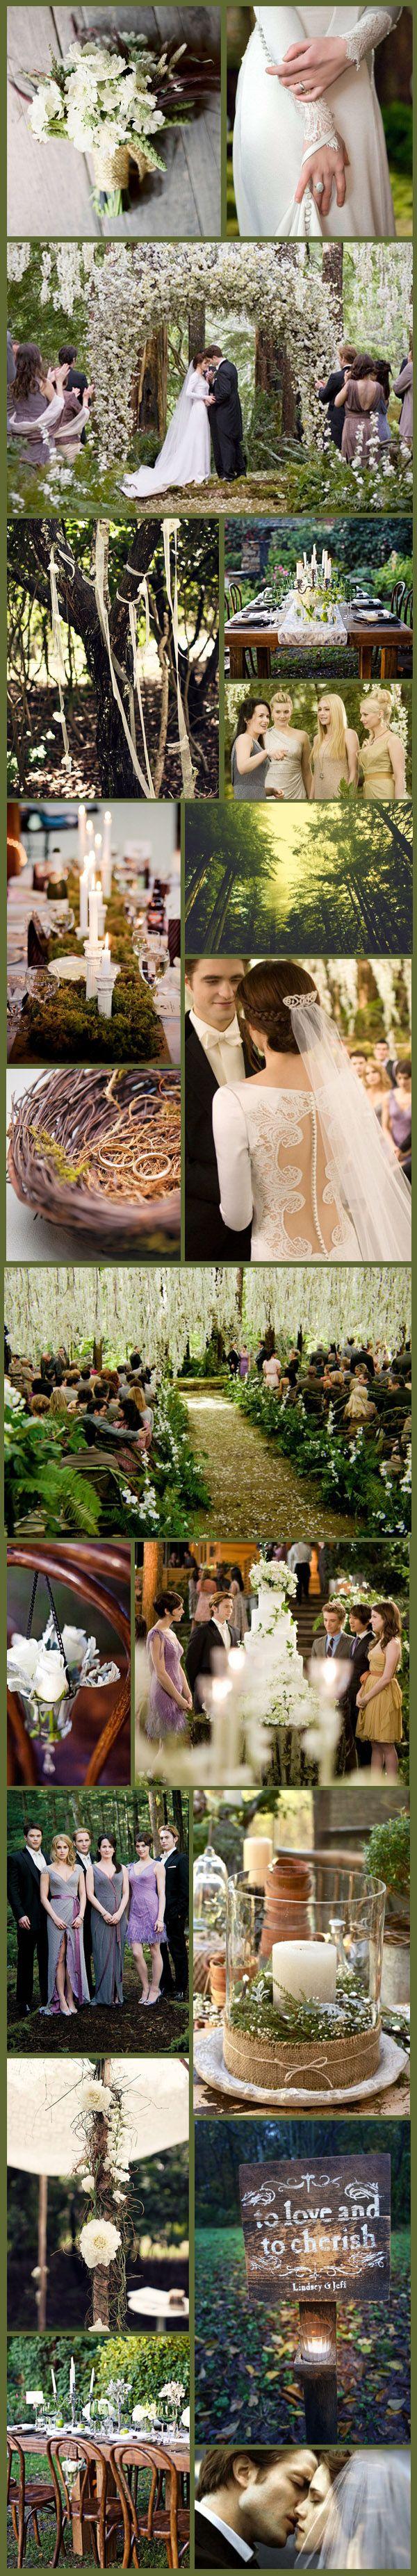 wednesday wedding inspiration twilight time inspiration boards